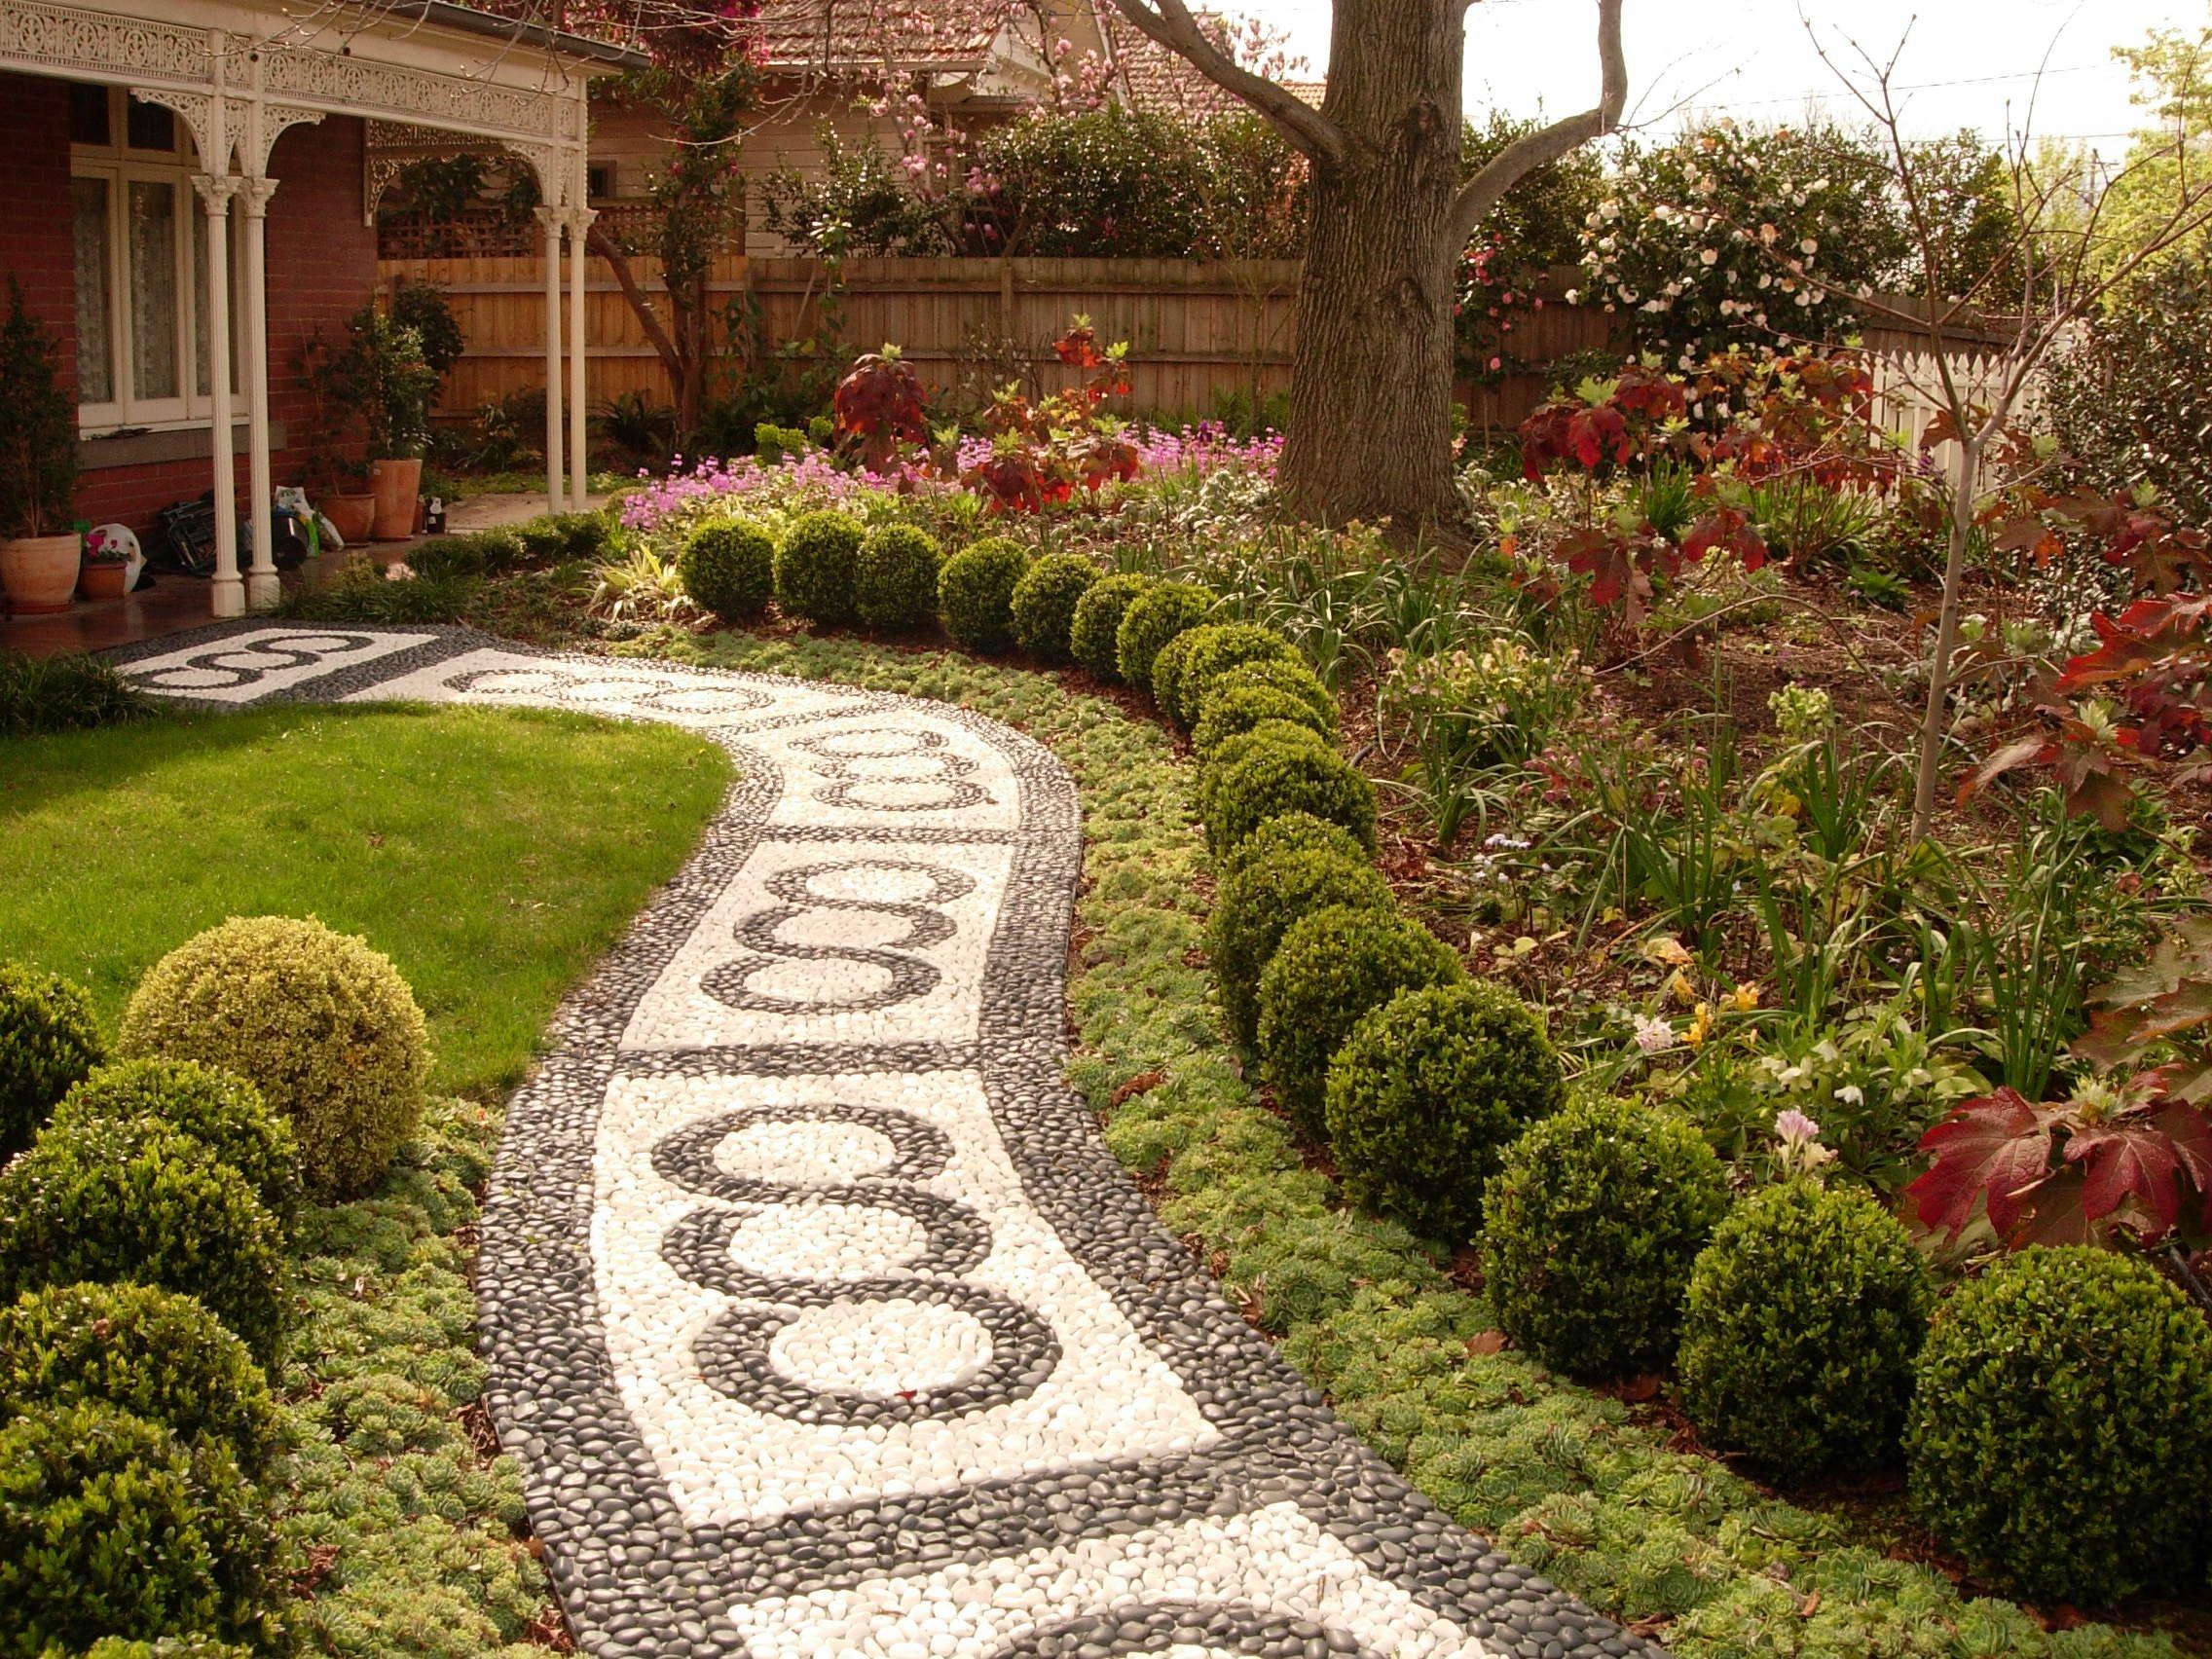 Pebble path, small stone path, triple circle design, black and white ...